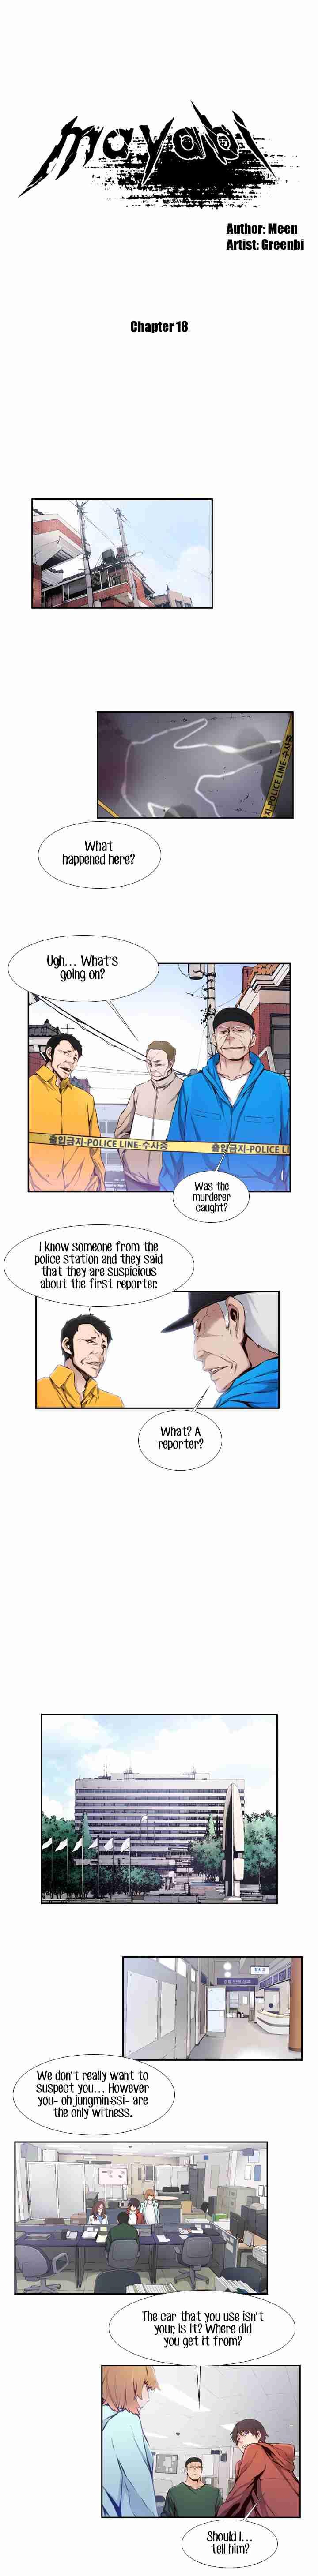 https://img2.nineanime.com/comics/pic1/0/15808/561568/f1178ff78a50fcb8de1f15d69a4c7c99.jpg Page 1